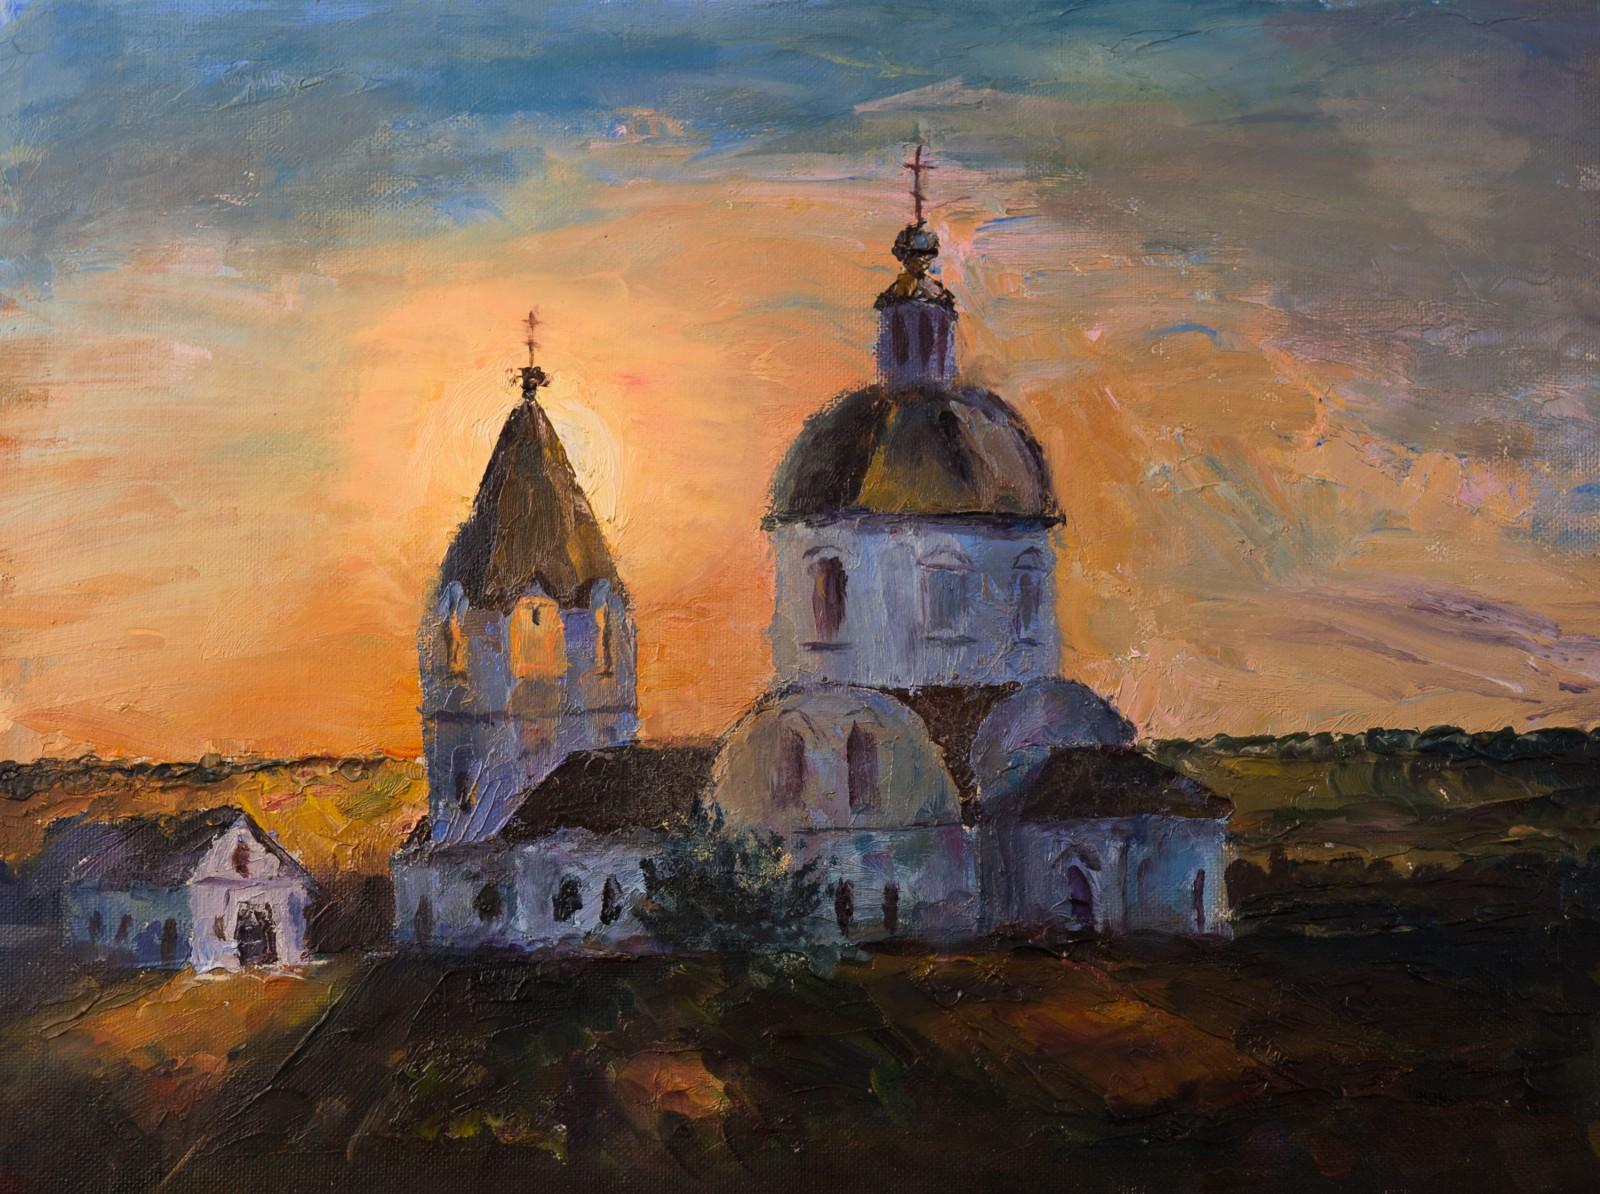 Художник Александр Патраков - Церковь, Богоявленск - Масло, холст на картоне, 40 x 30